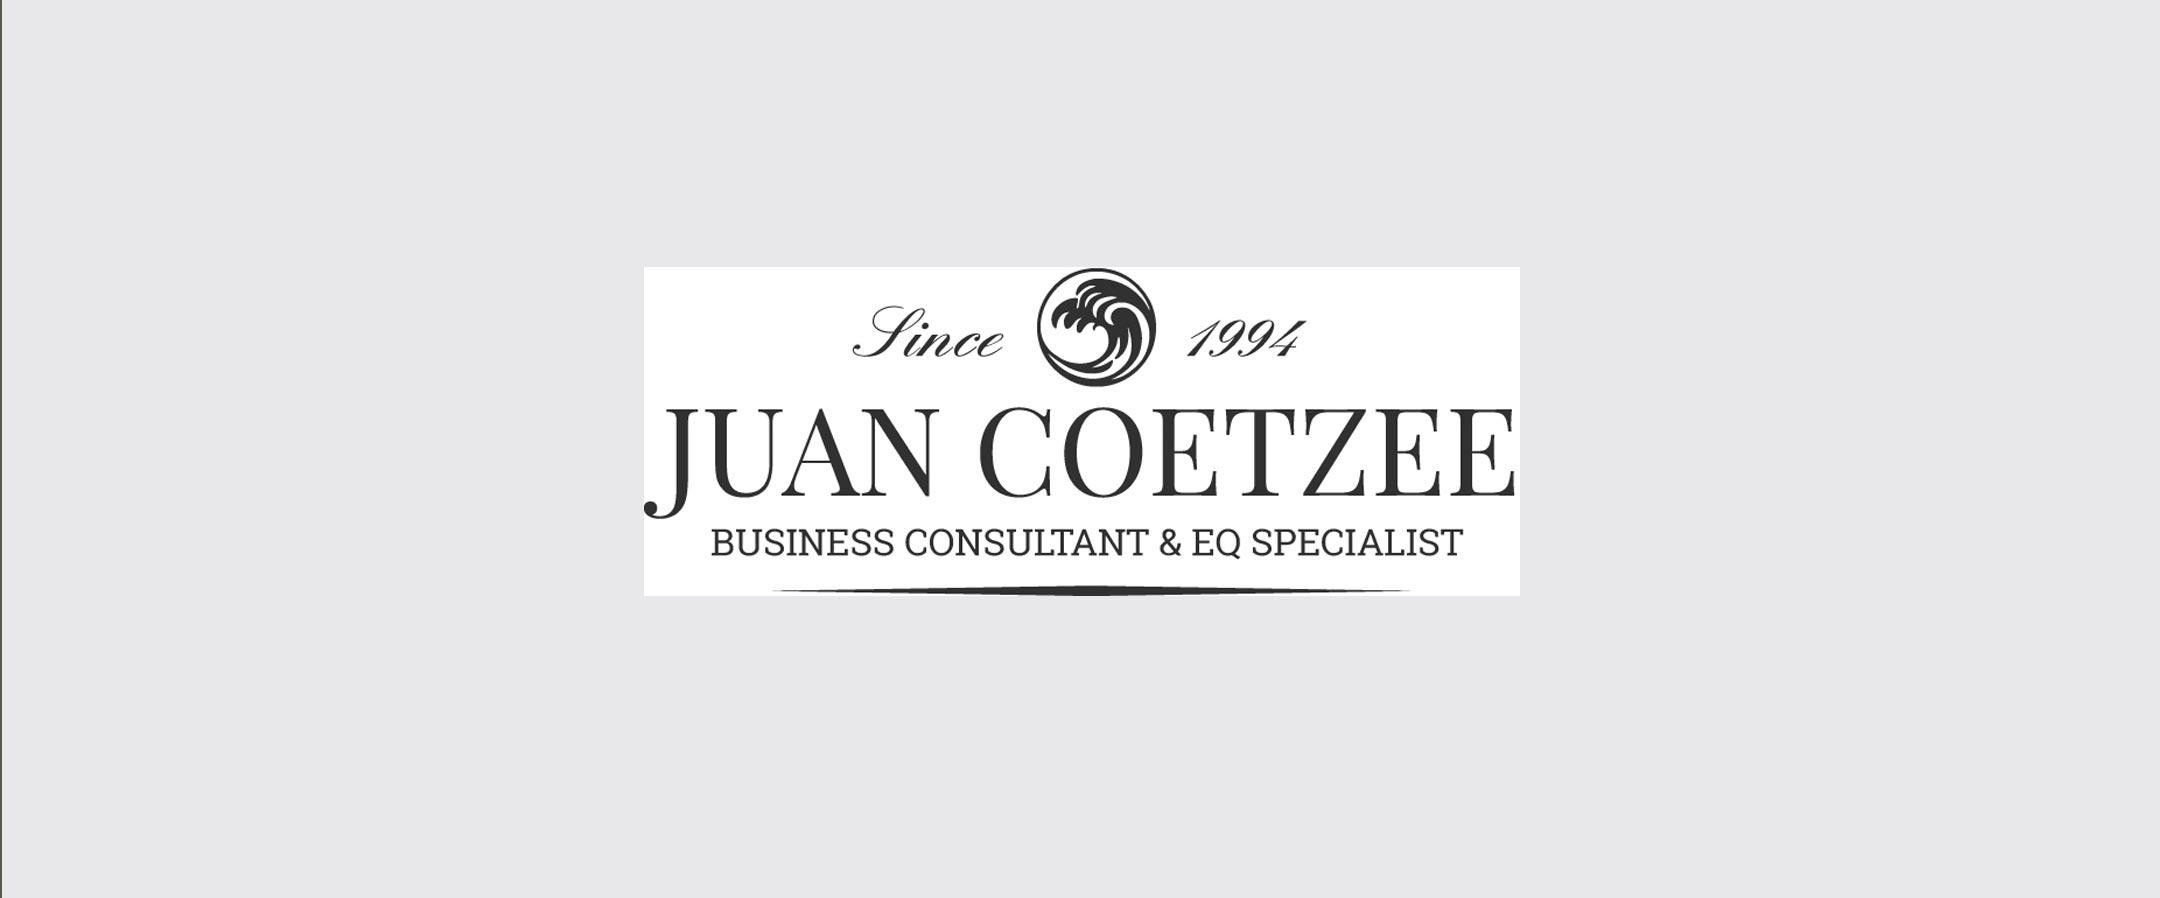 juan header - Juan Coetzee Consulting